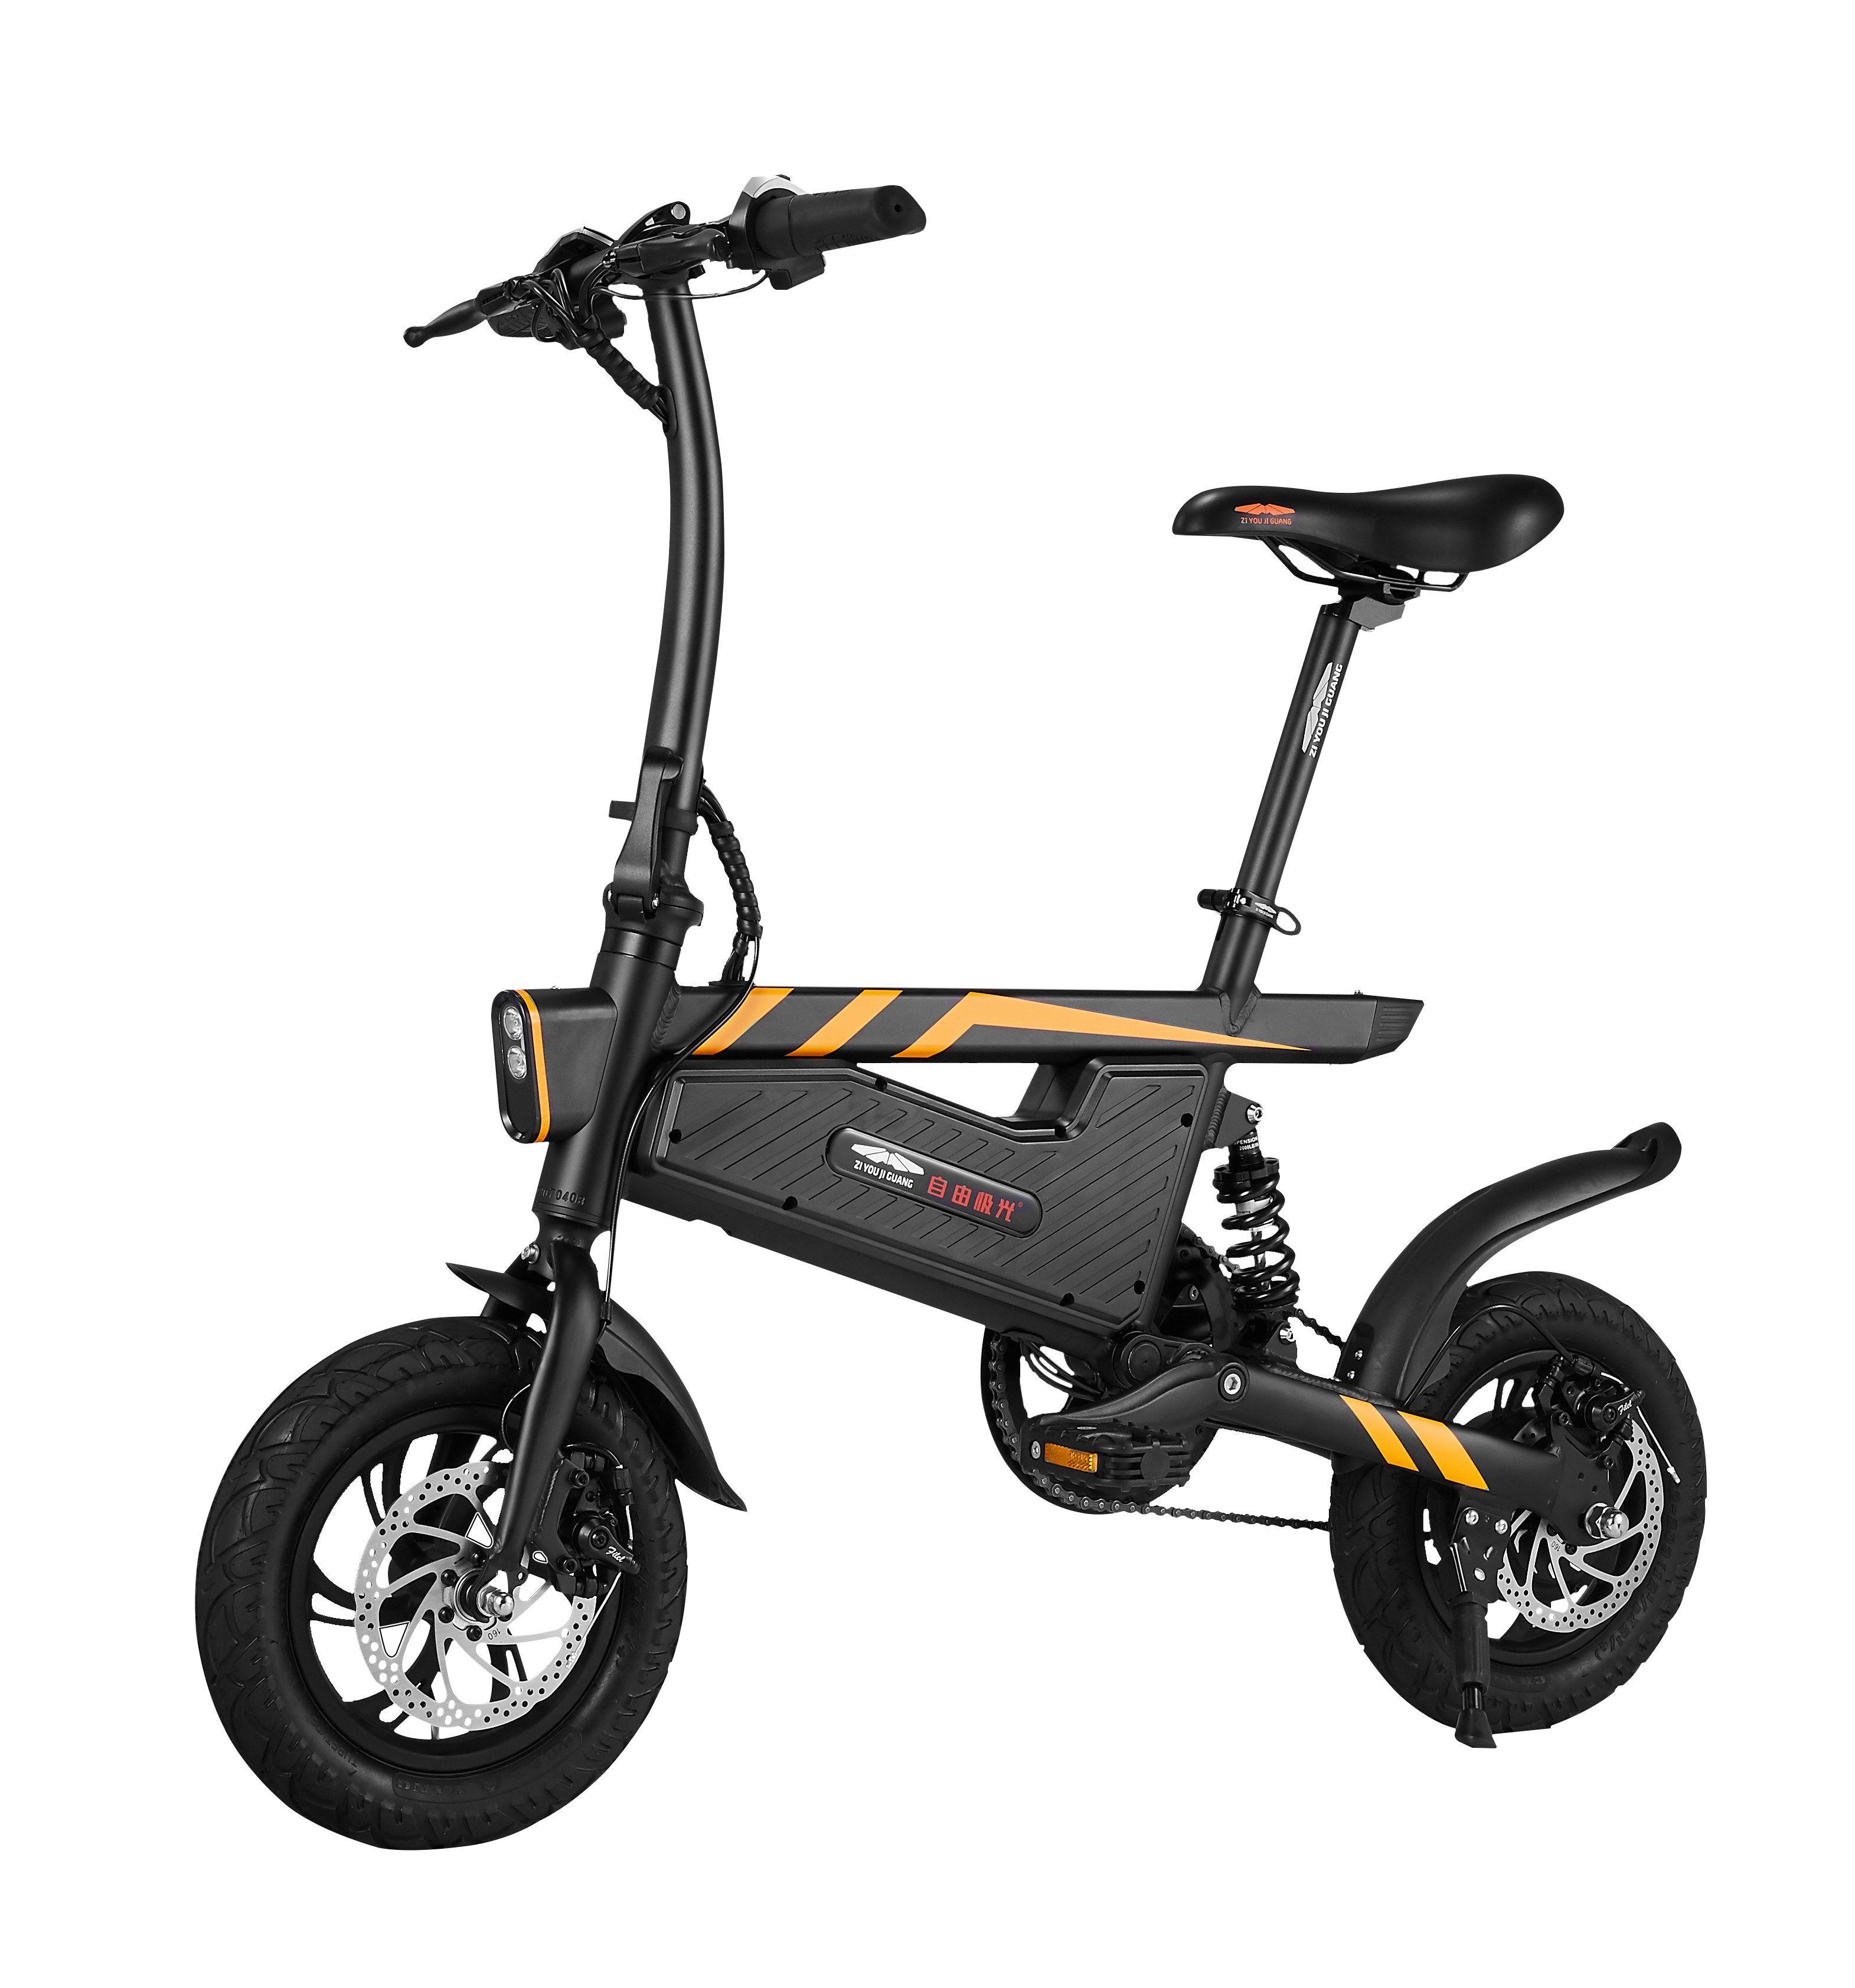 Ziyoujiguang T18 Klapp Elektrische Fahrrad Leichte 250W Motor Elektrische Bike Durable Bike t18 Anti-Explosion E Bike Ebike